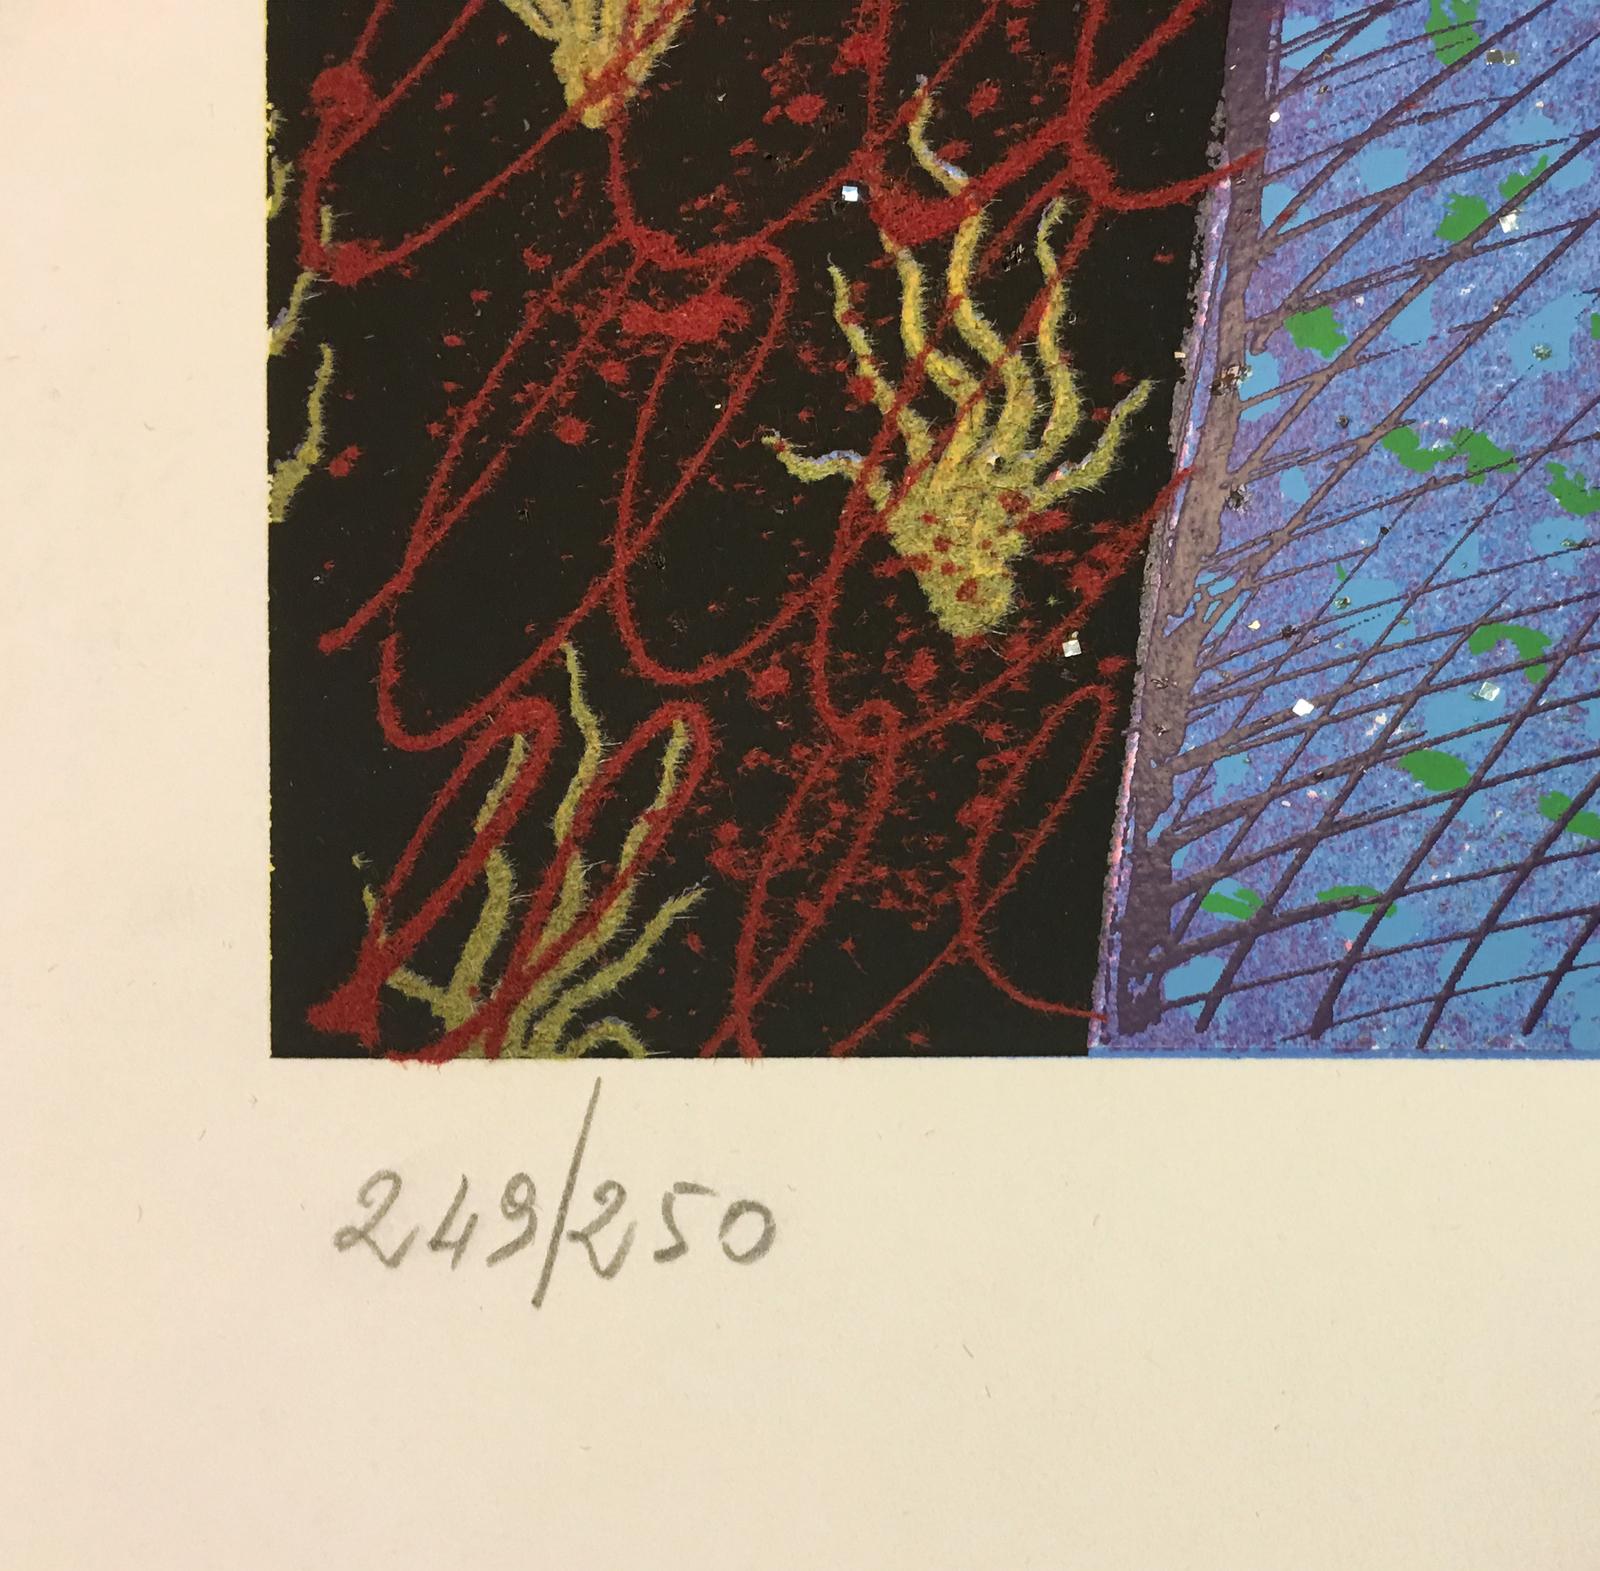 "Enrico Baj ""Untitled"" 1972 - Hand Signed Print - COA - See Live at GallArt"